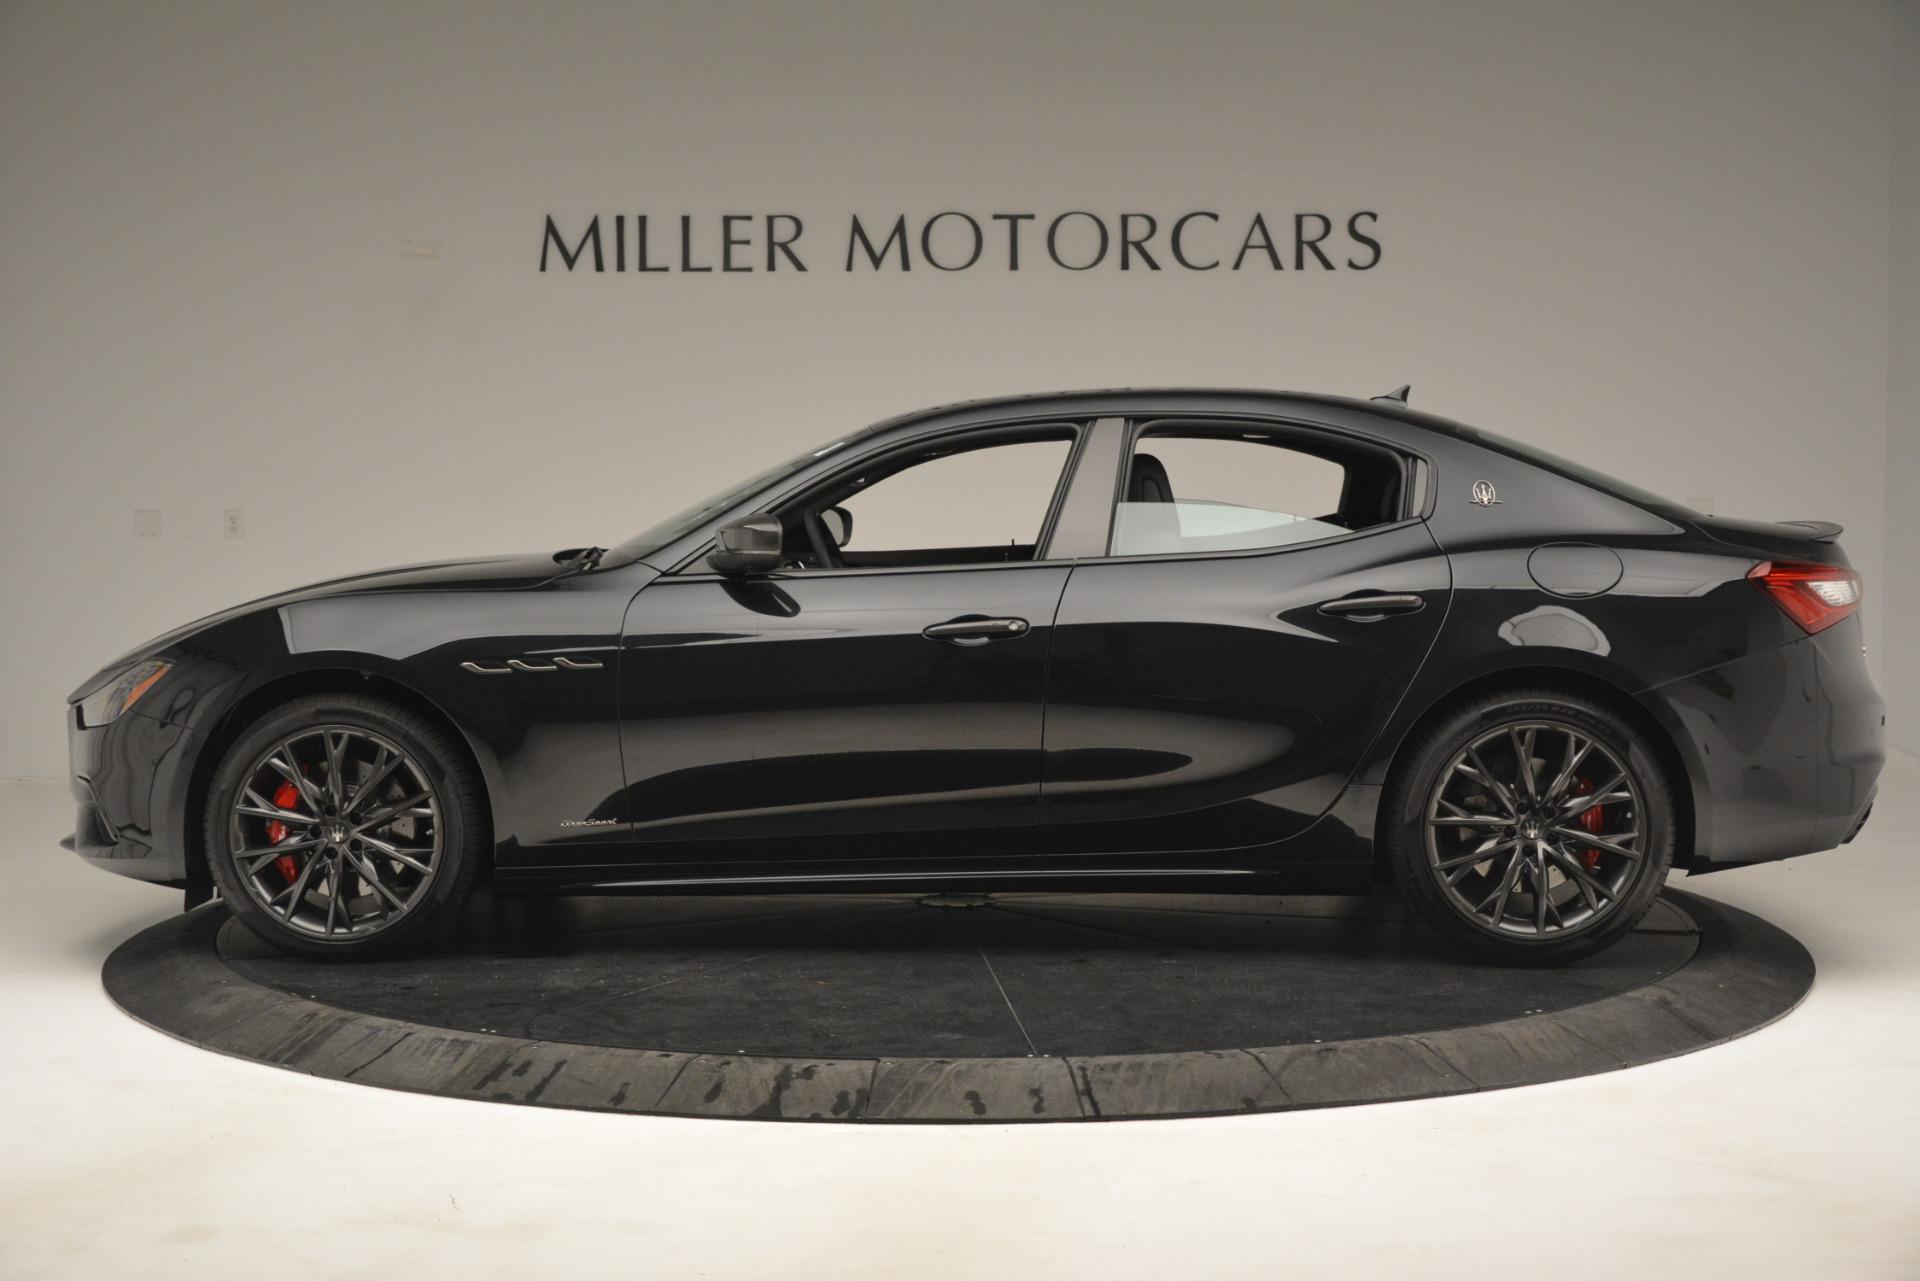 New 2019 Maserati Ghibli S Q4 GranSport For Sale In Greenwich, CT. Alfa Romeo of Greenwich, W668 2926_p3